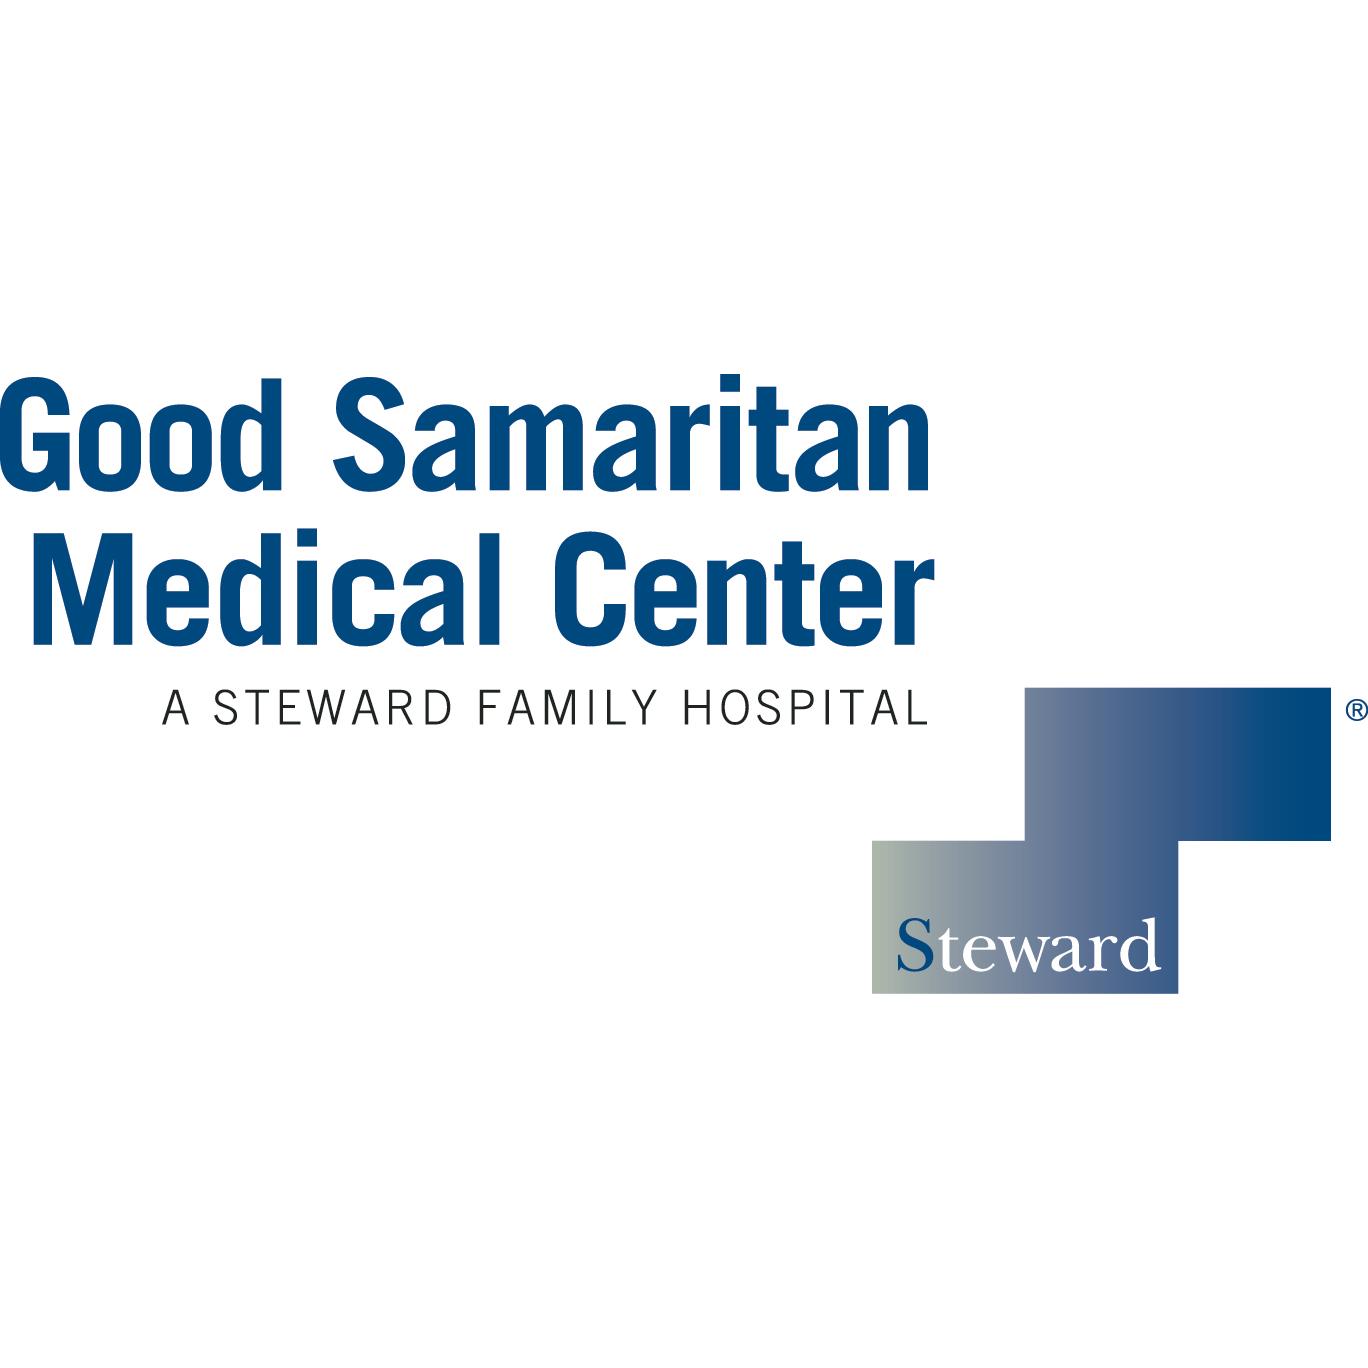 Good Samaritan Medical Center - ChamberofCommerce.com